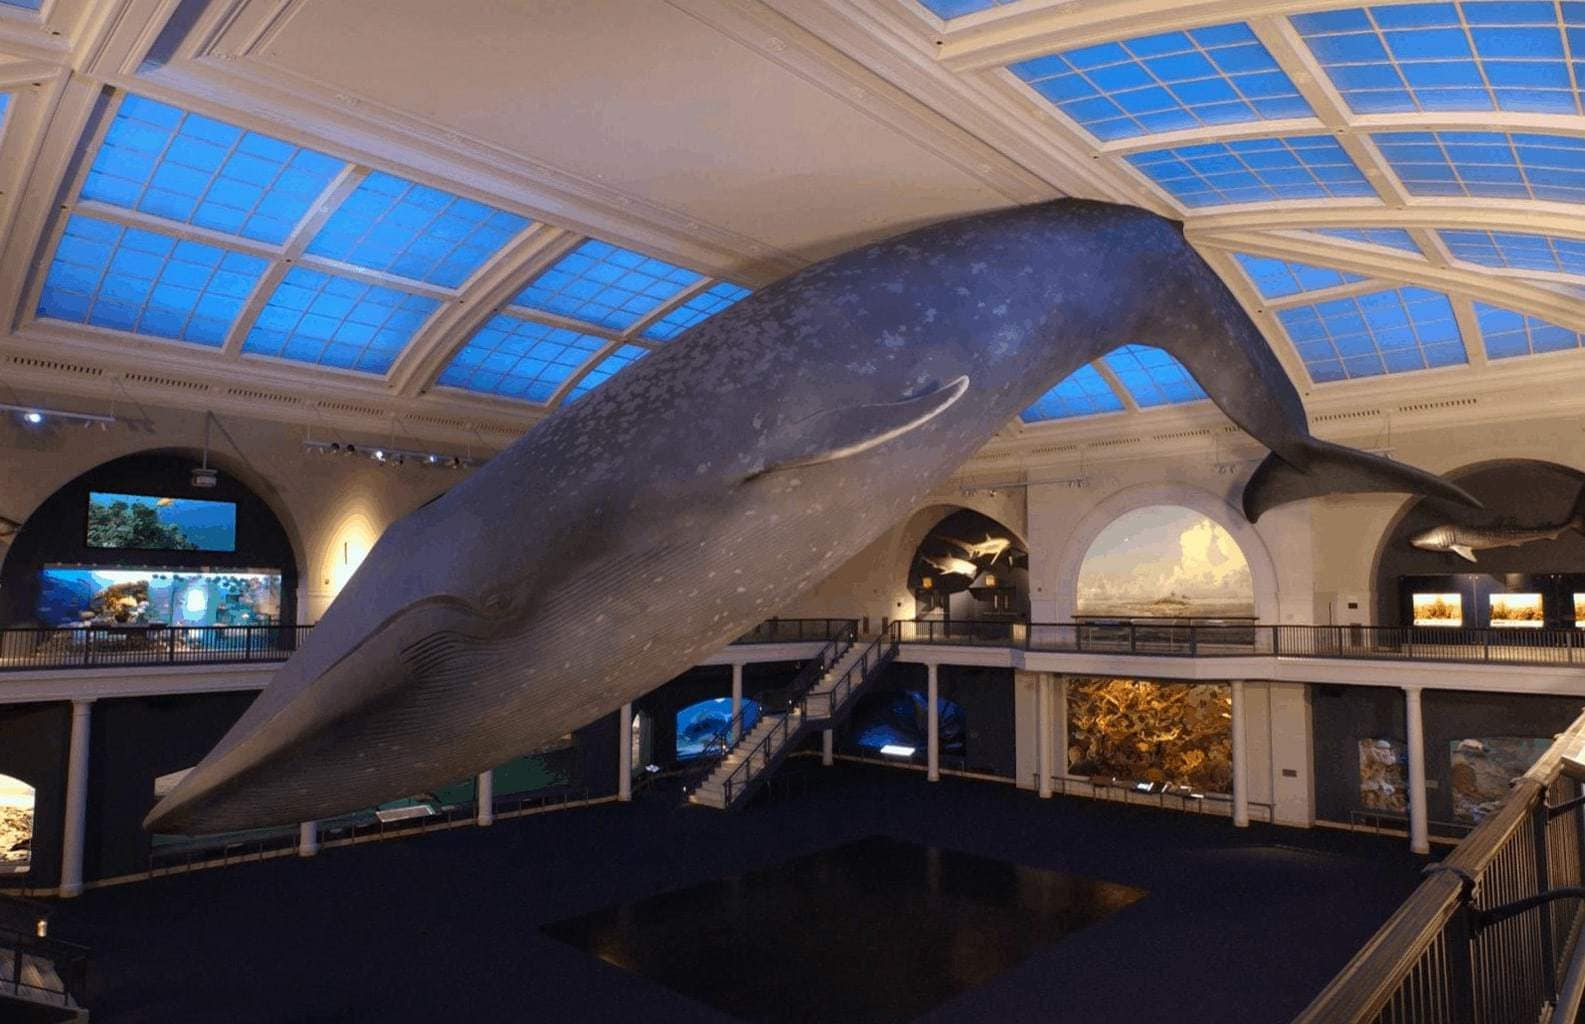 ©American Museum of Natural History / Chesek